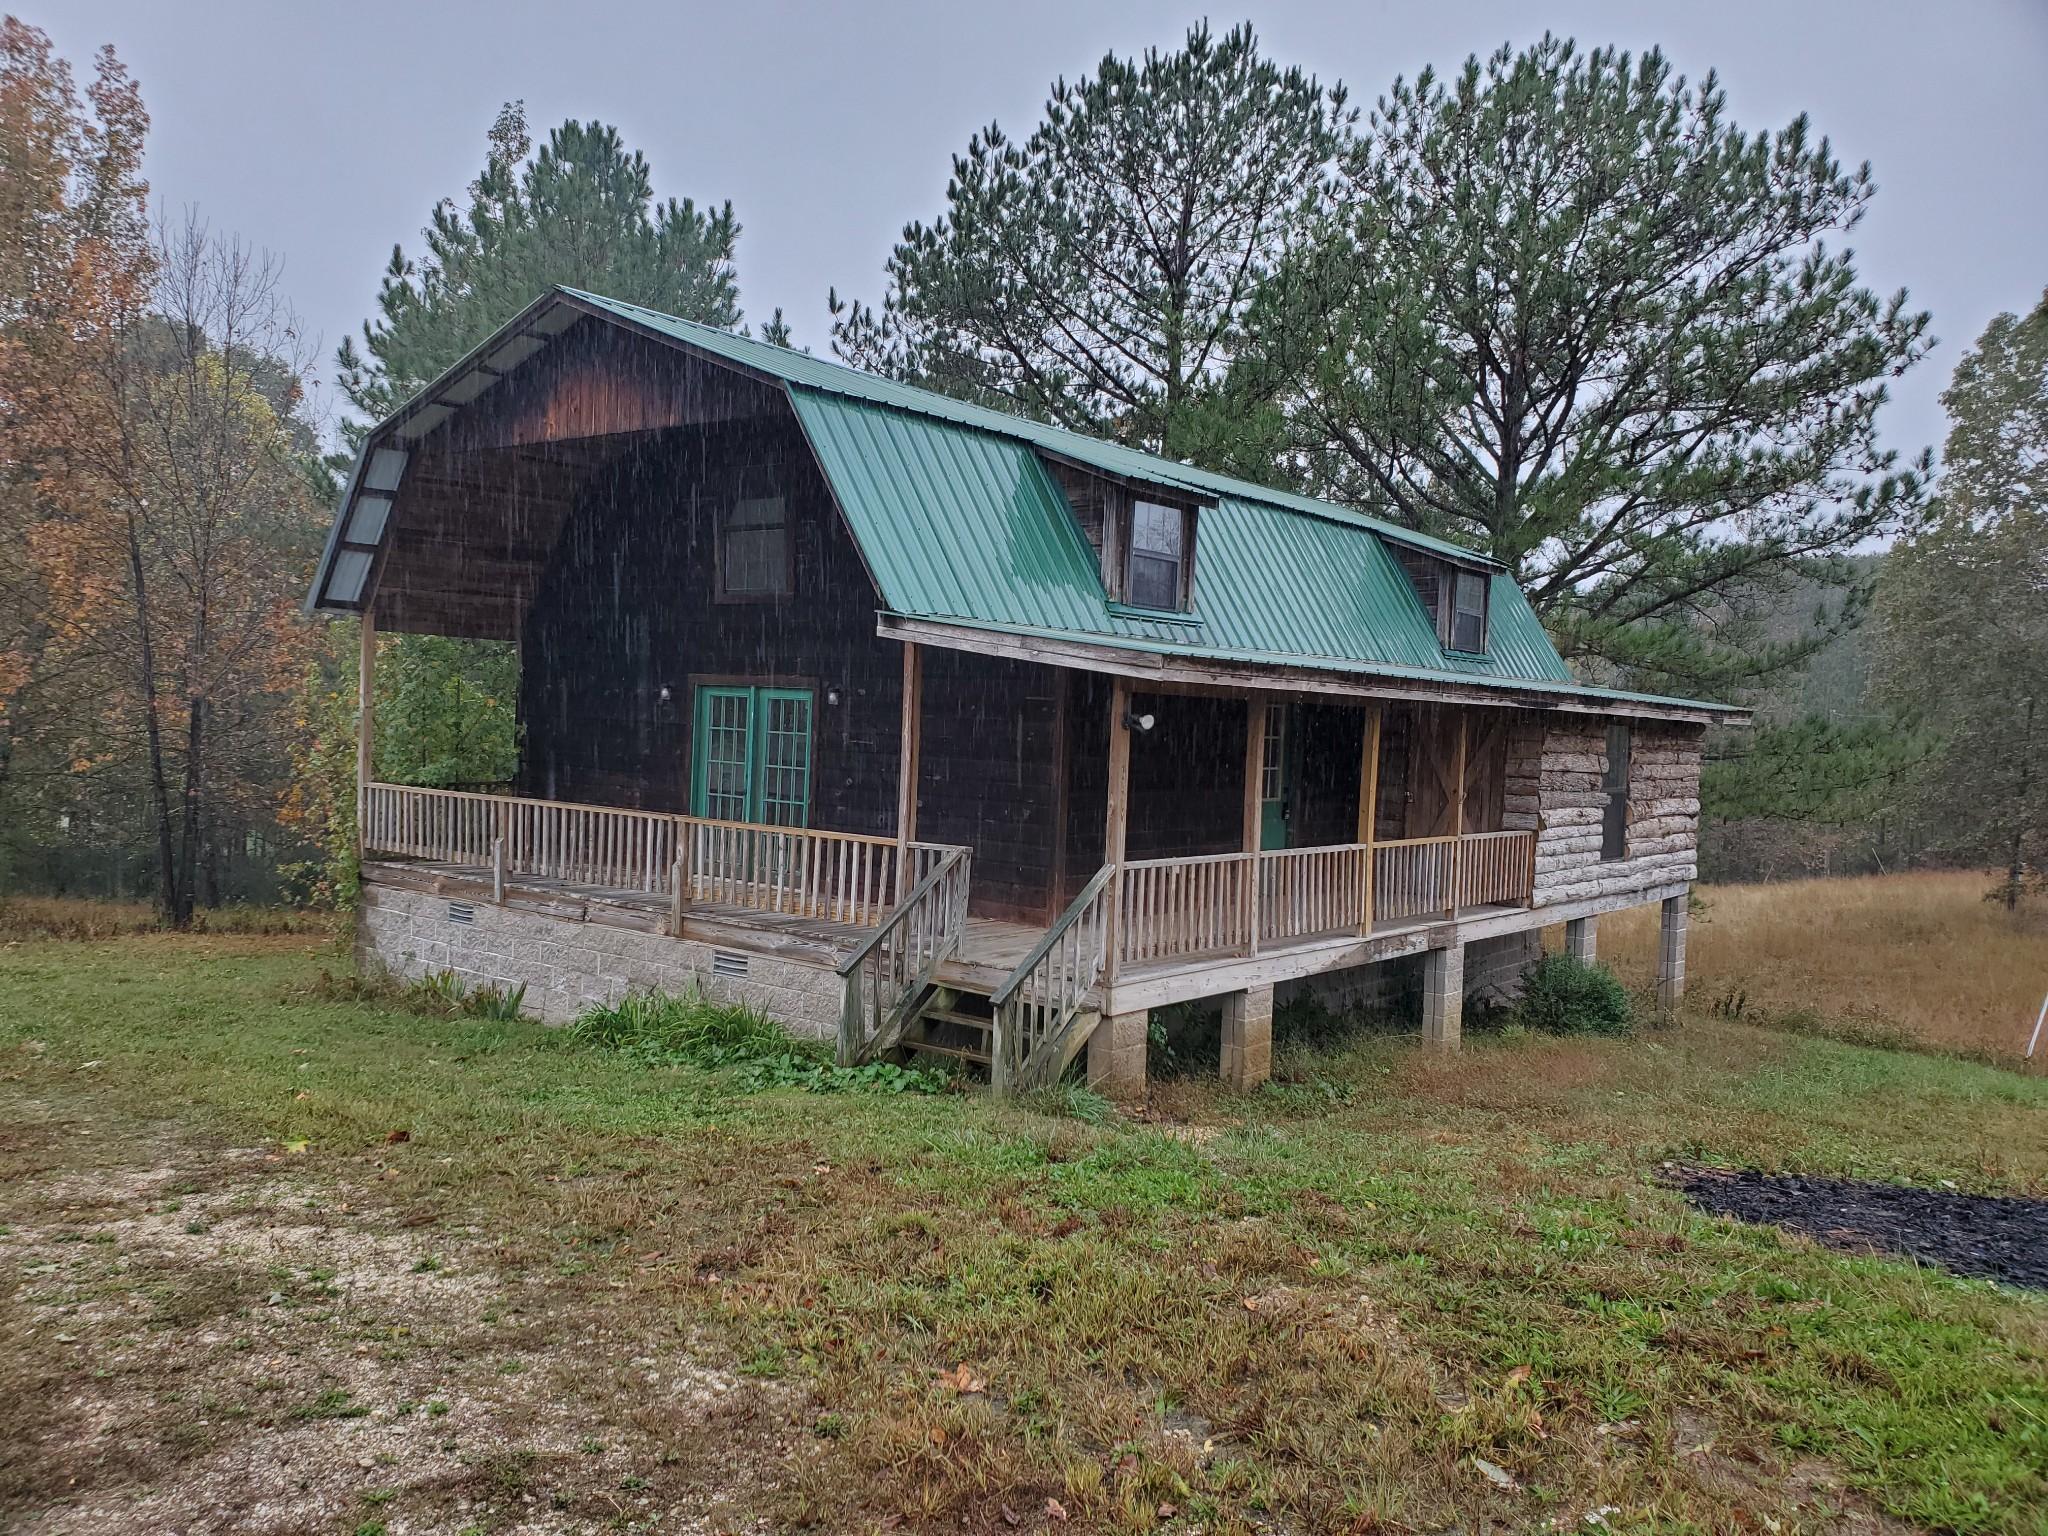 6791 Clydeton Rd, Waverly, TN 37185 - Waverly, TN real estate listing